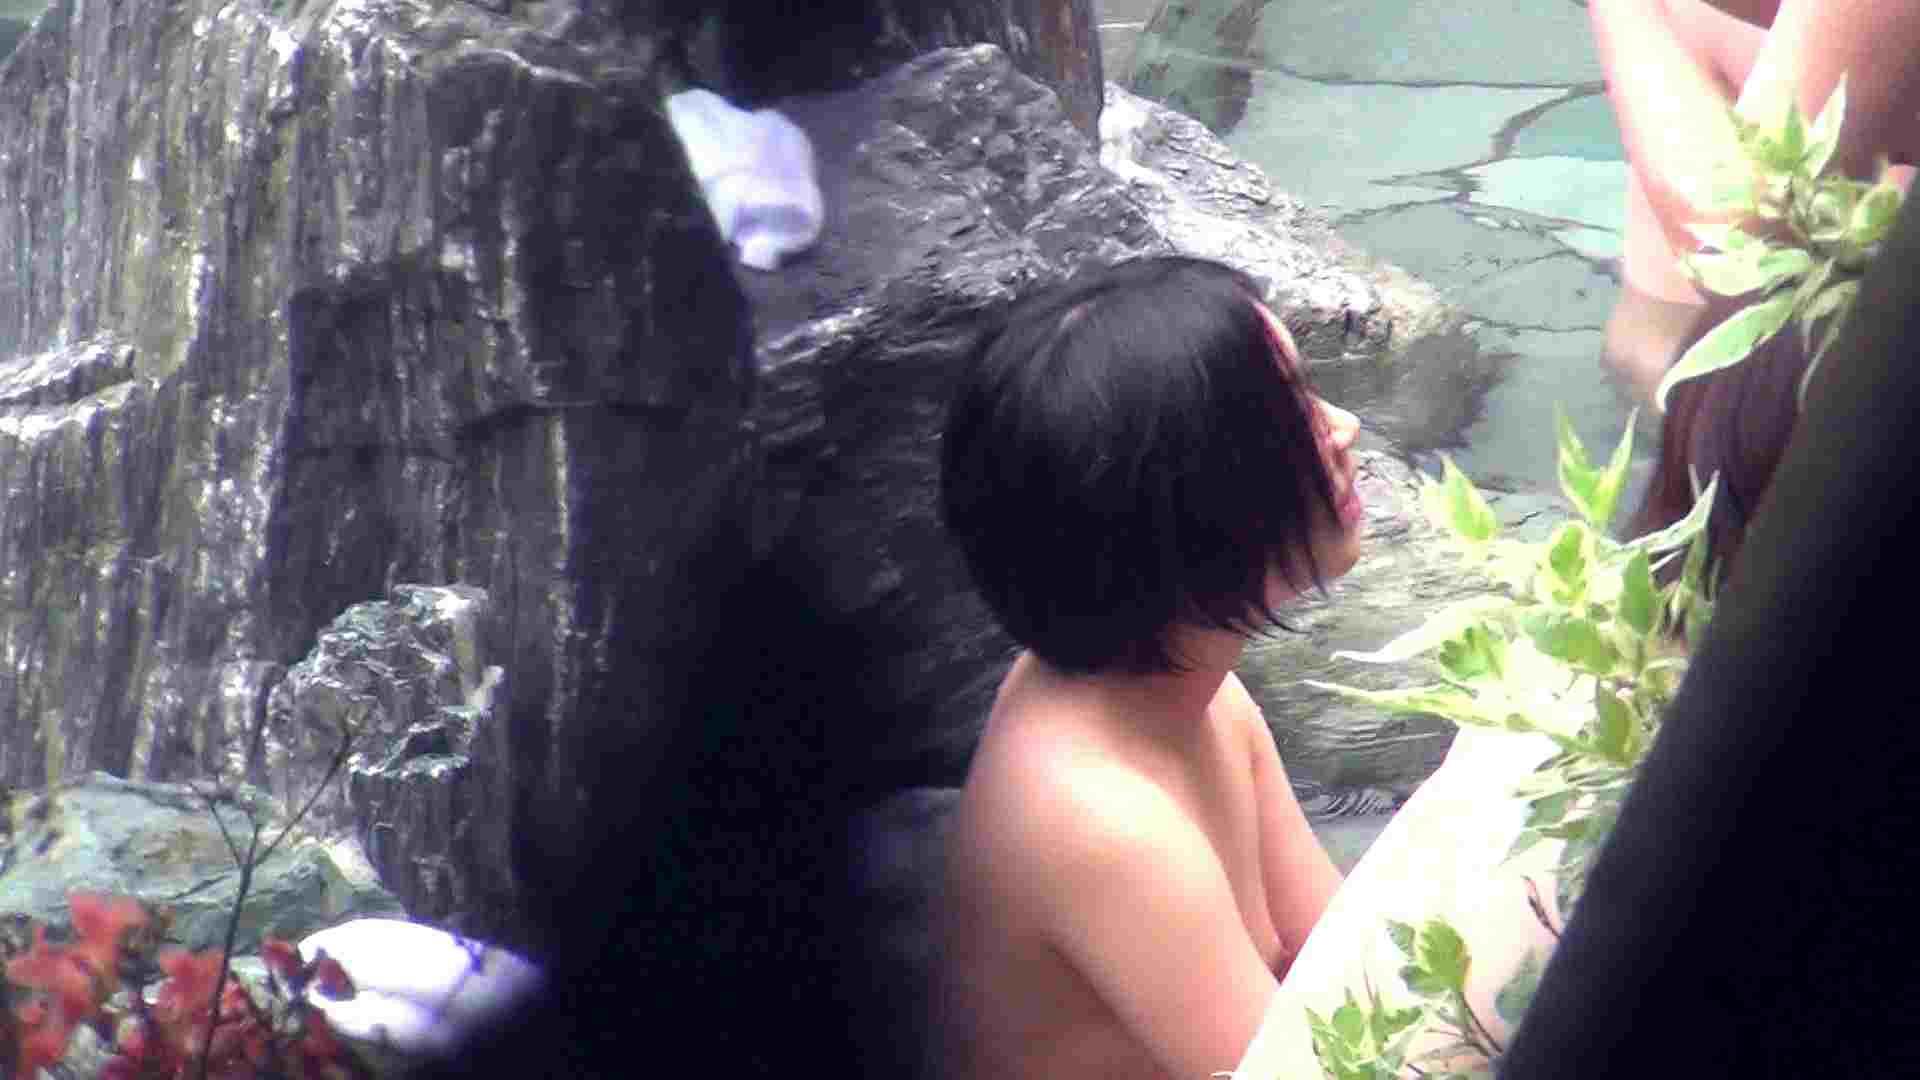 Aquaな露天風呂Vol.276 OLセックス 隠し撮りオマンコ動画紹介 72画像 35